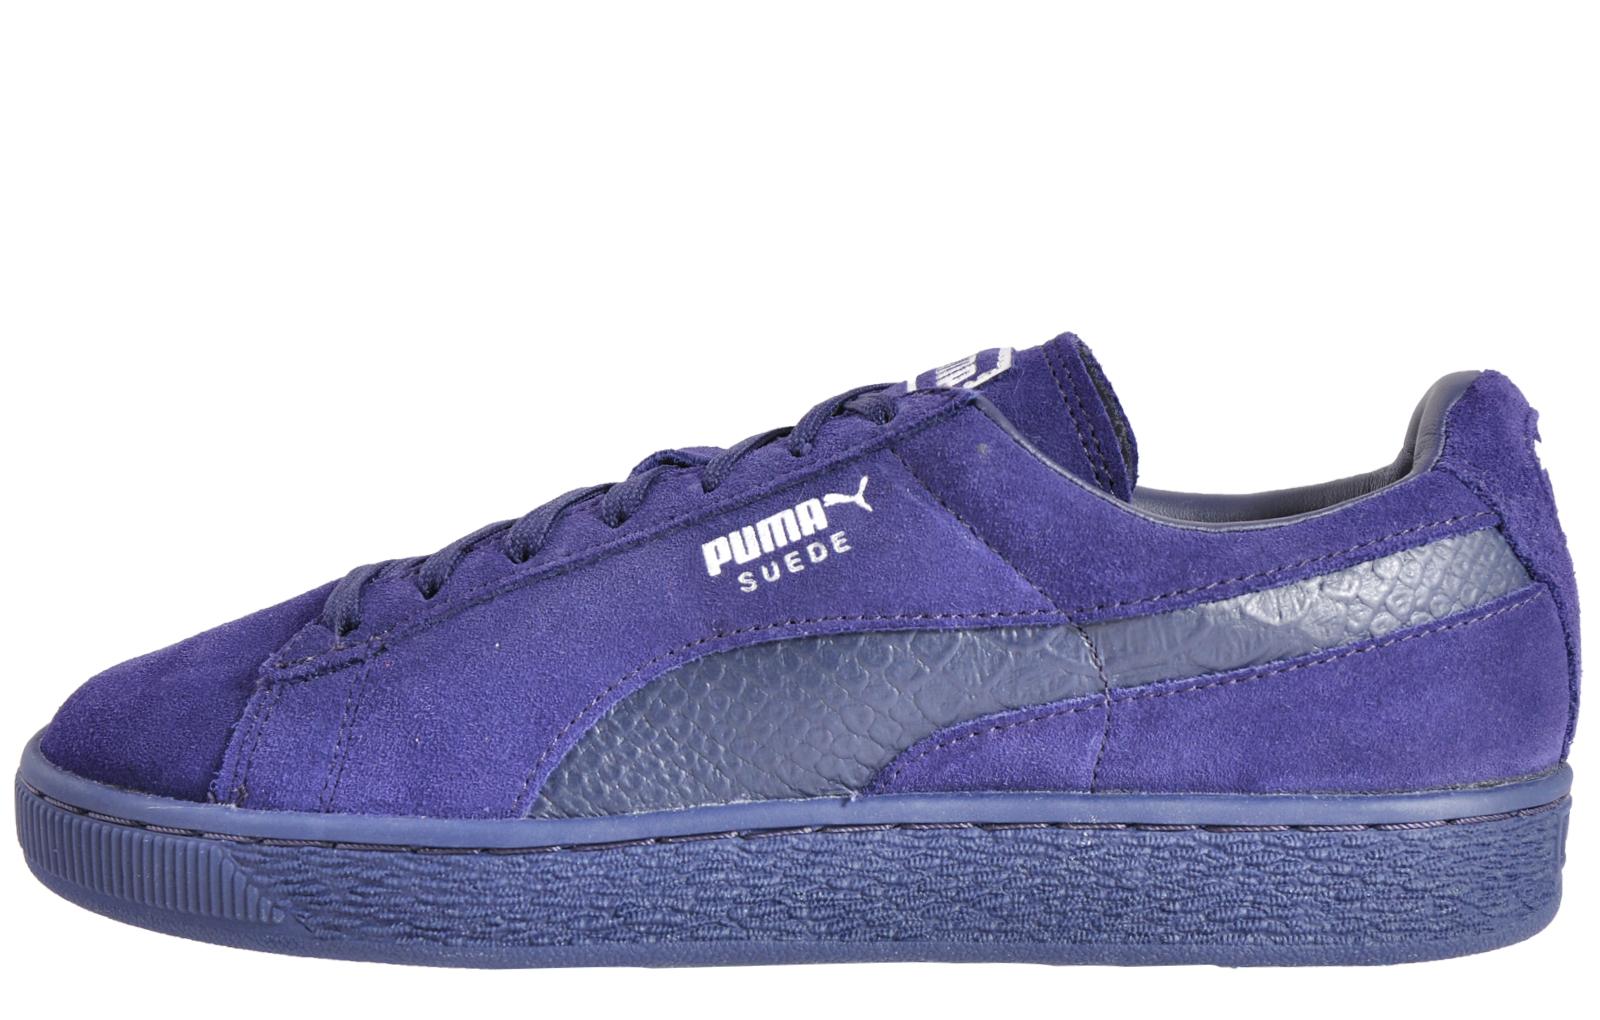 separation shoes 17e8b b43f6 Mens Puma Trainers Sale | Cheap Mens Puma Suede Trainers